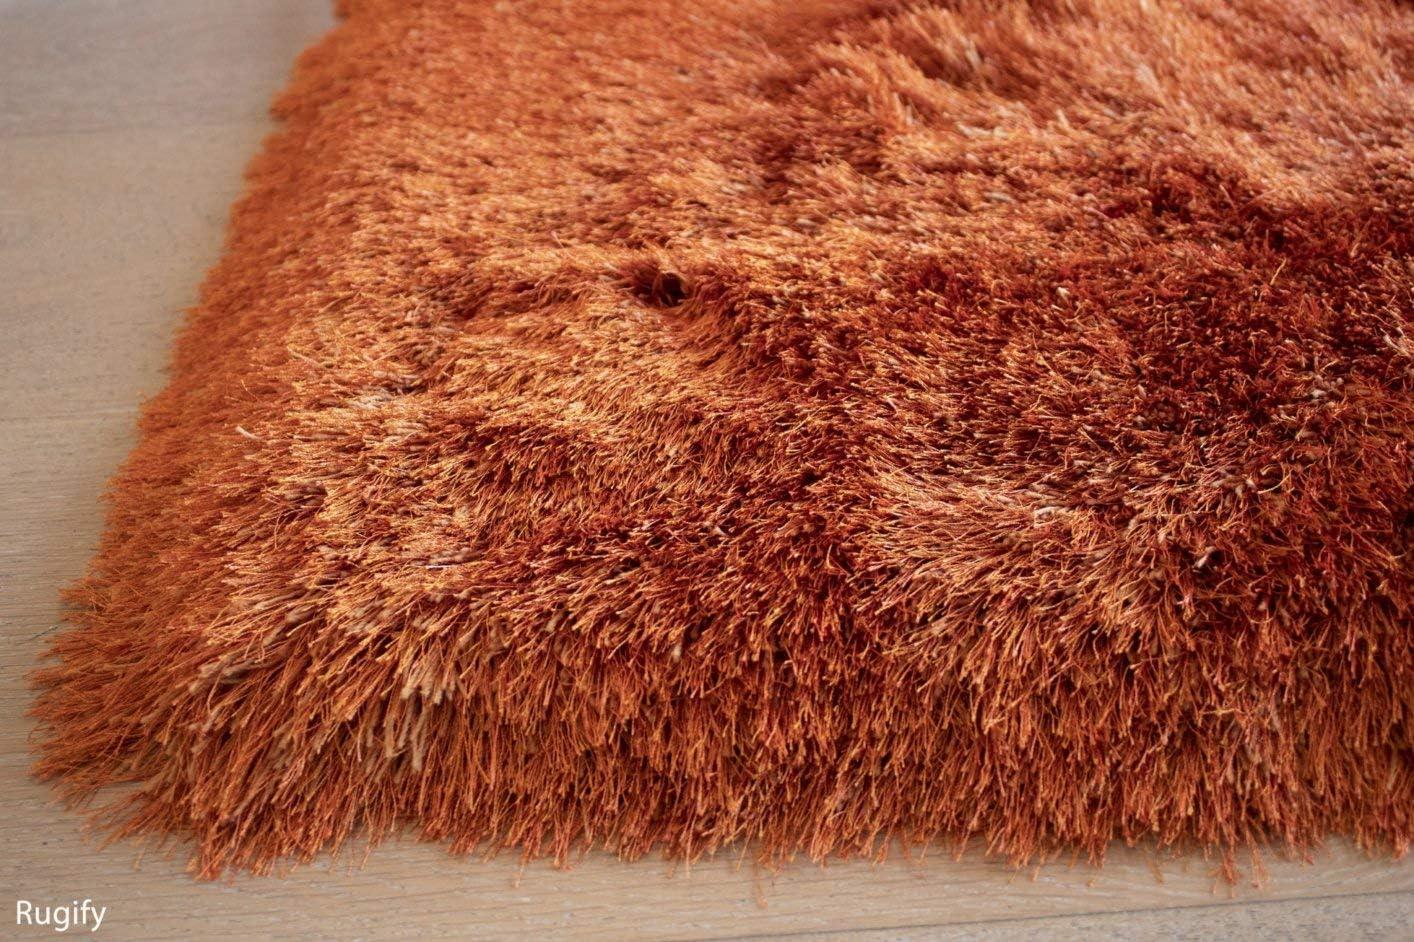 8×10 Feet Rust Orange Dark Orange Color Shag Plush Shaggy Fuzzy Furry Pattern Area Rug Carpet Rug Hand-Woven Shimmer Cozy Contemporary Modern Comfortable Soft Living Room Bedroom Decorative Designer Carpet